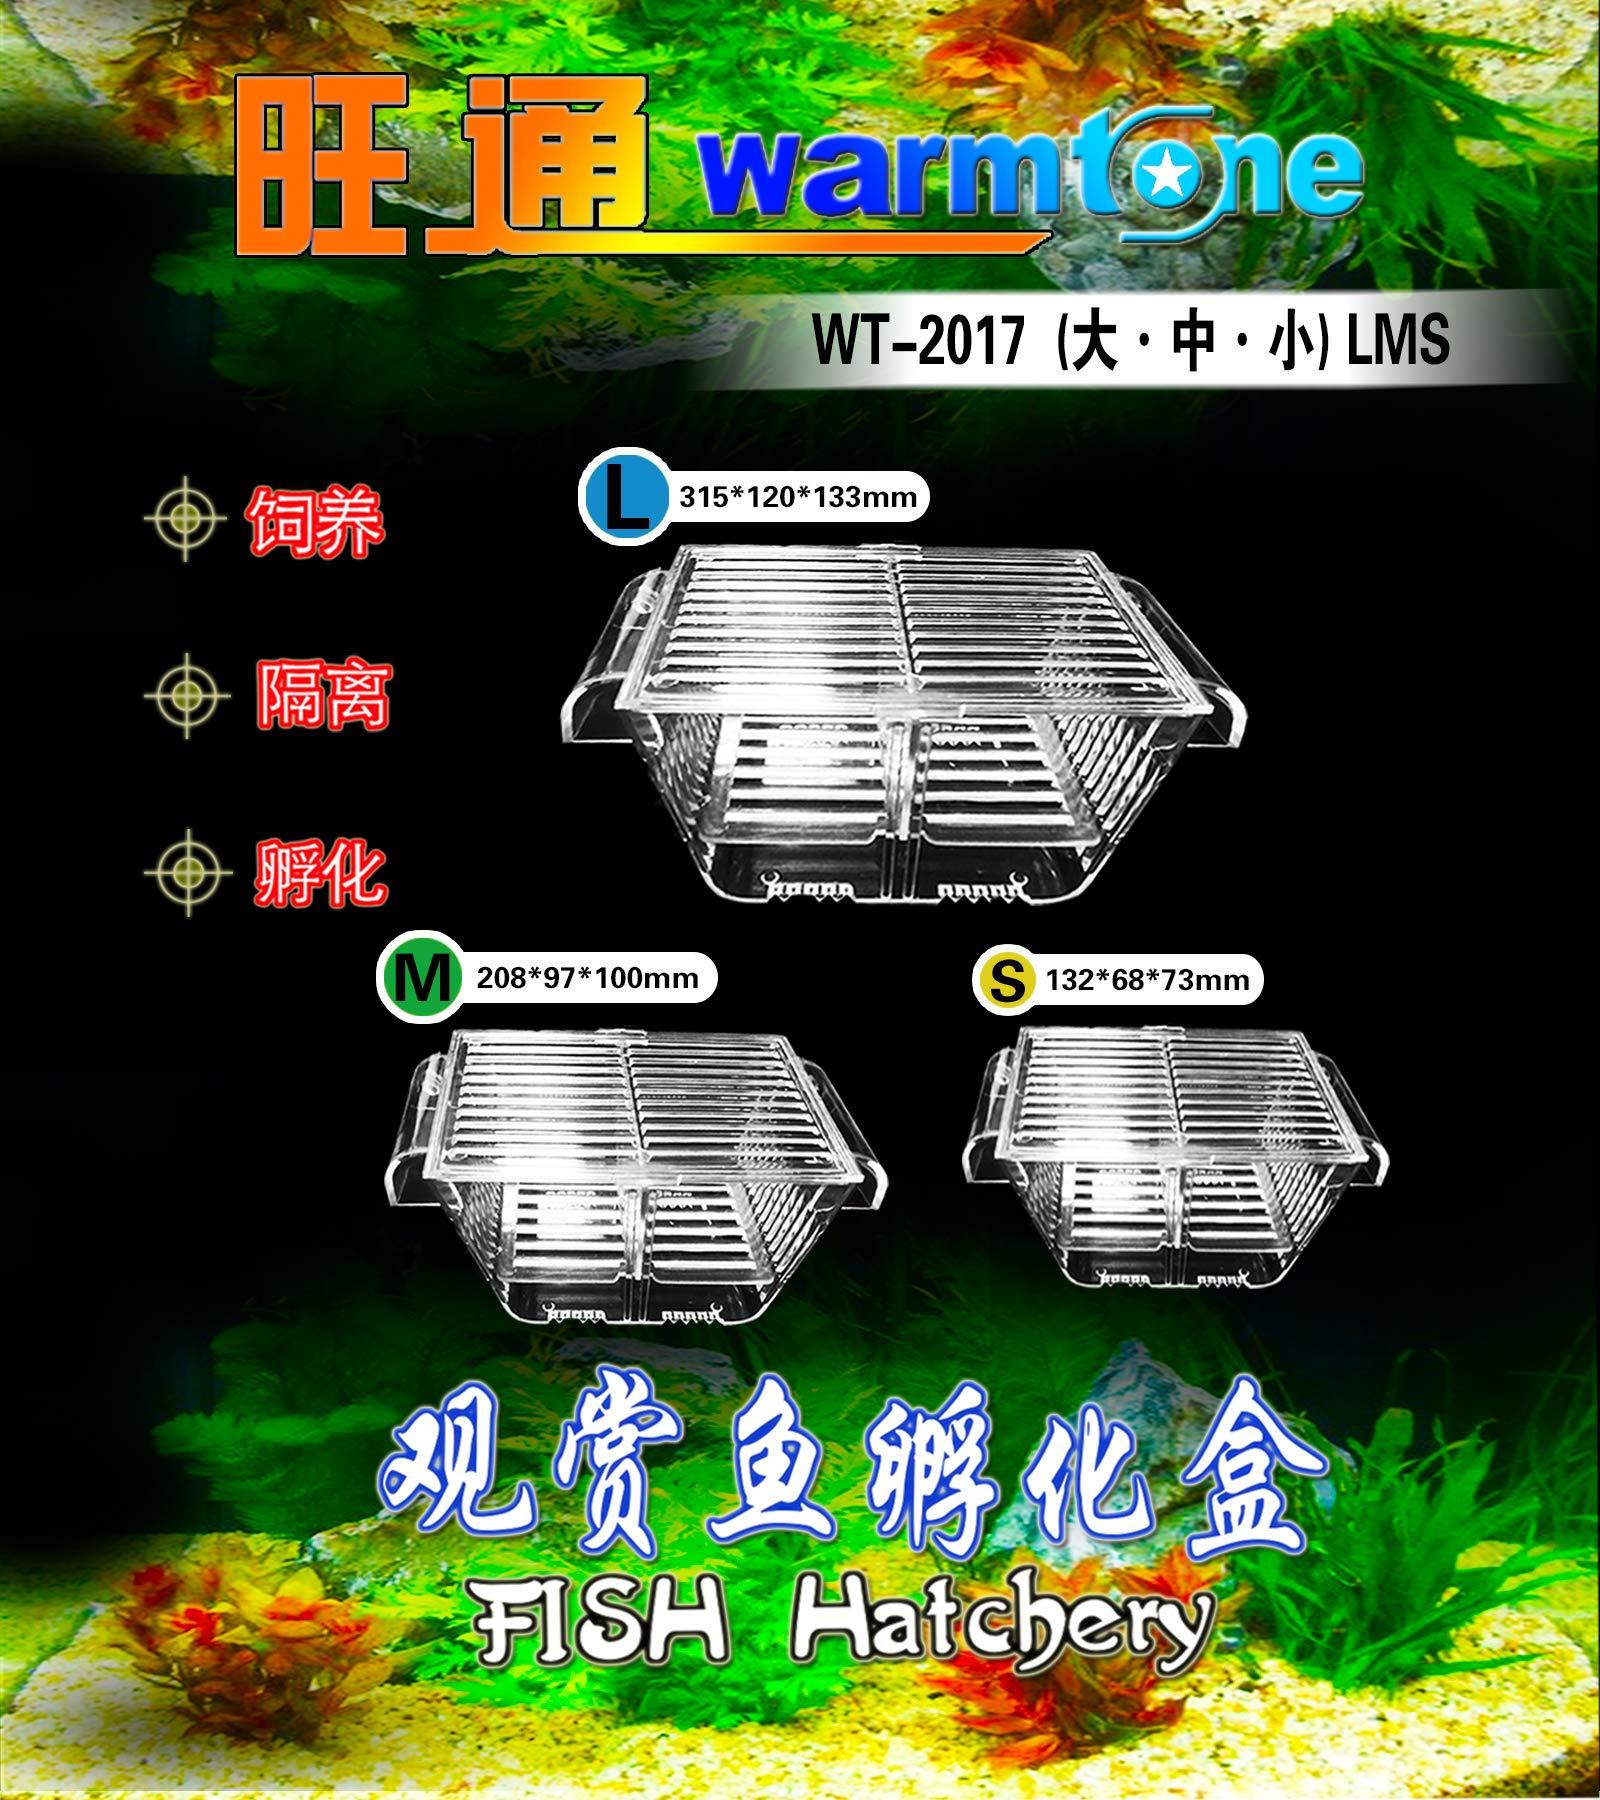 capetsma Fish Breeding Box, Acrylic Fish Isolation Box with Suction Cups, Aquarium Acclimation Hatchery Incubator for…